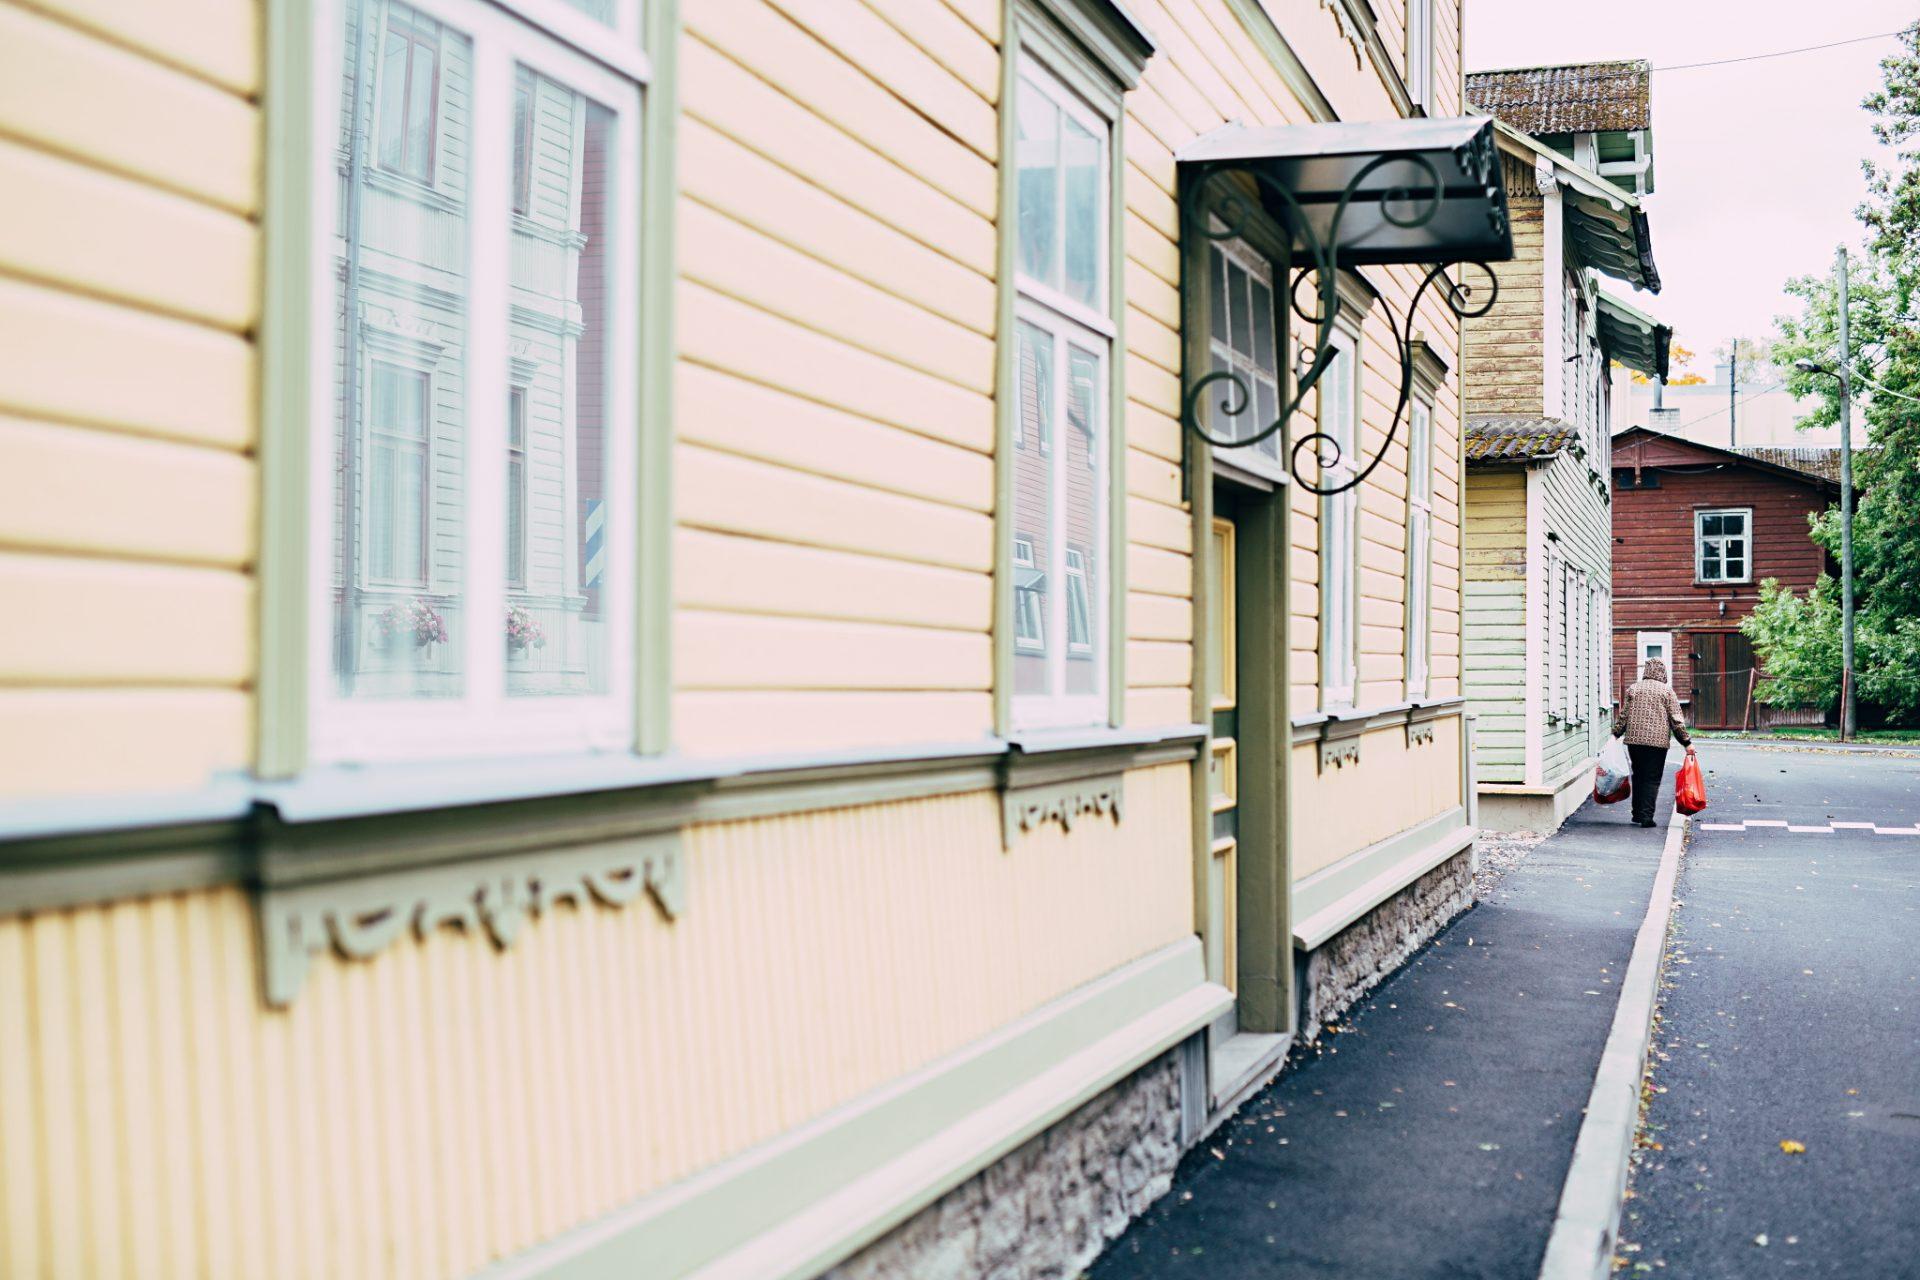 estland_053_web